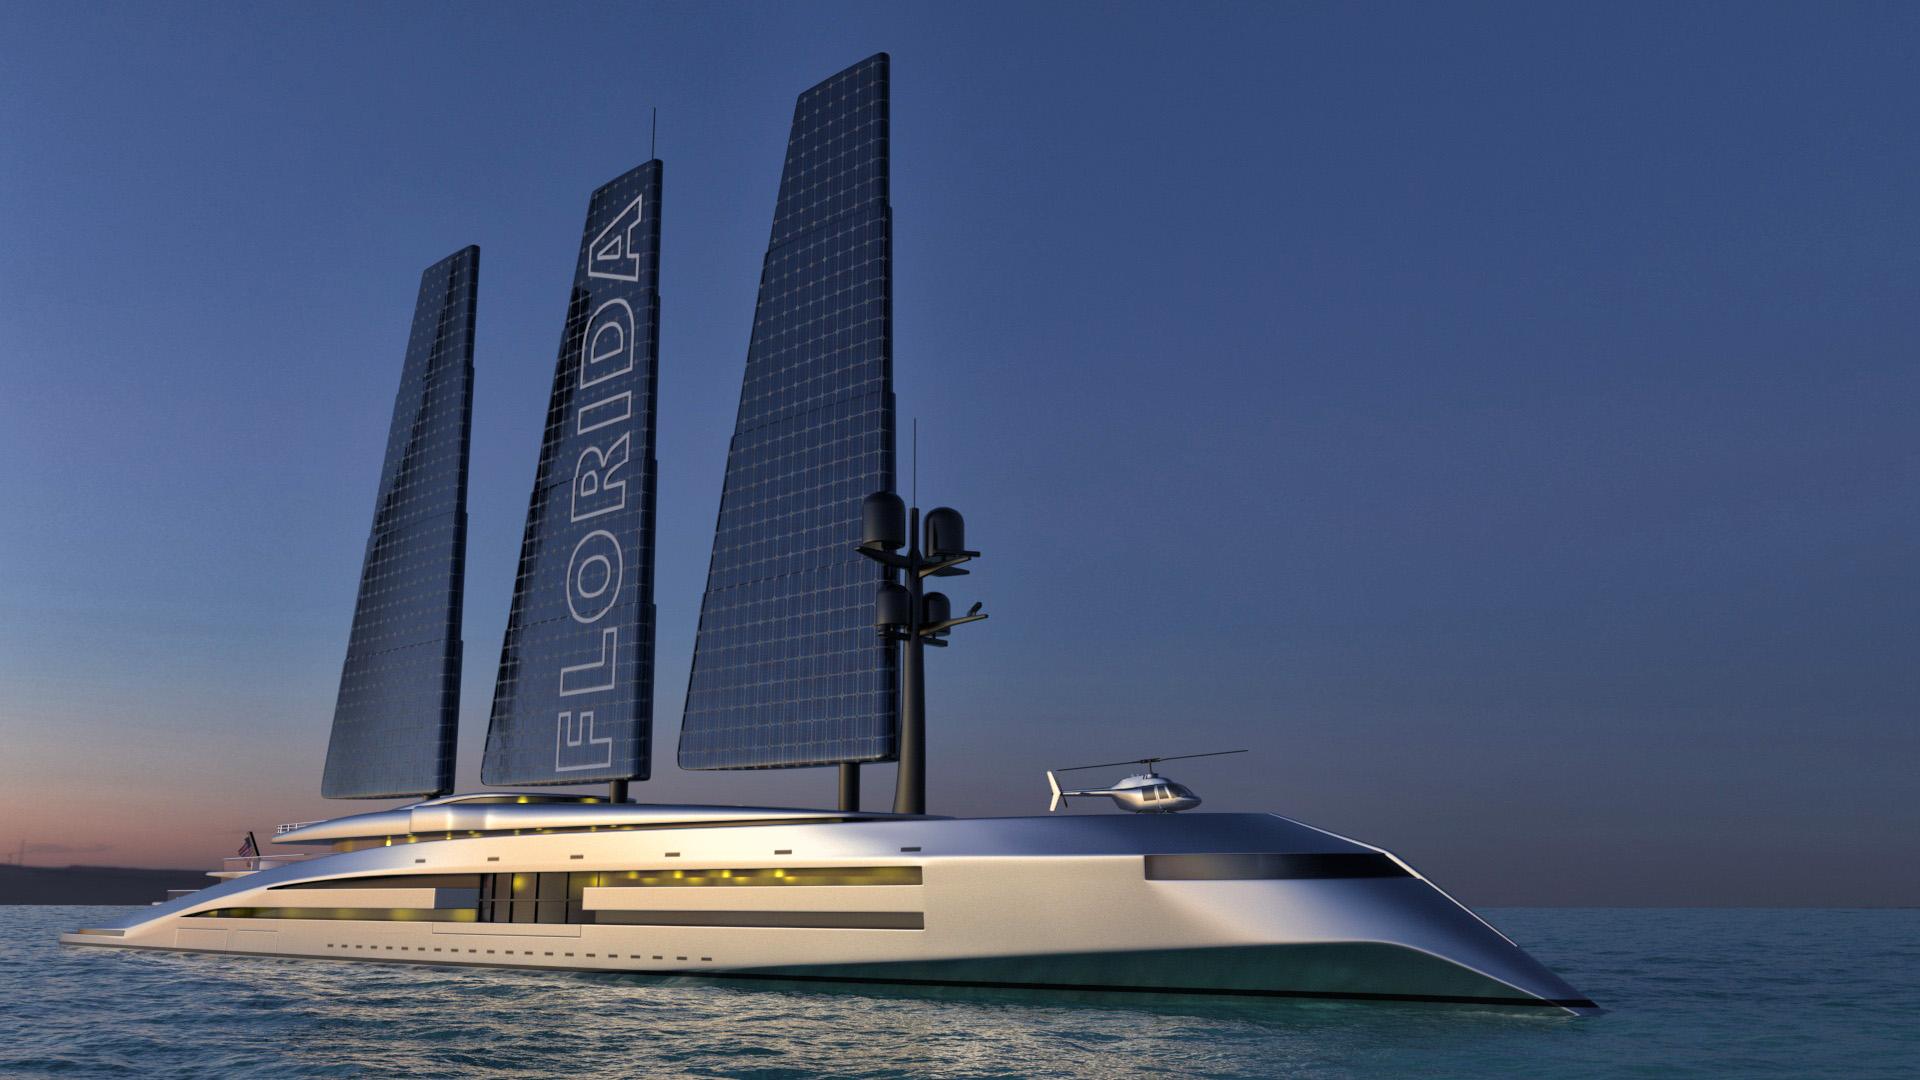 render of Florida superyacht at night